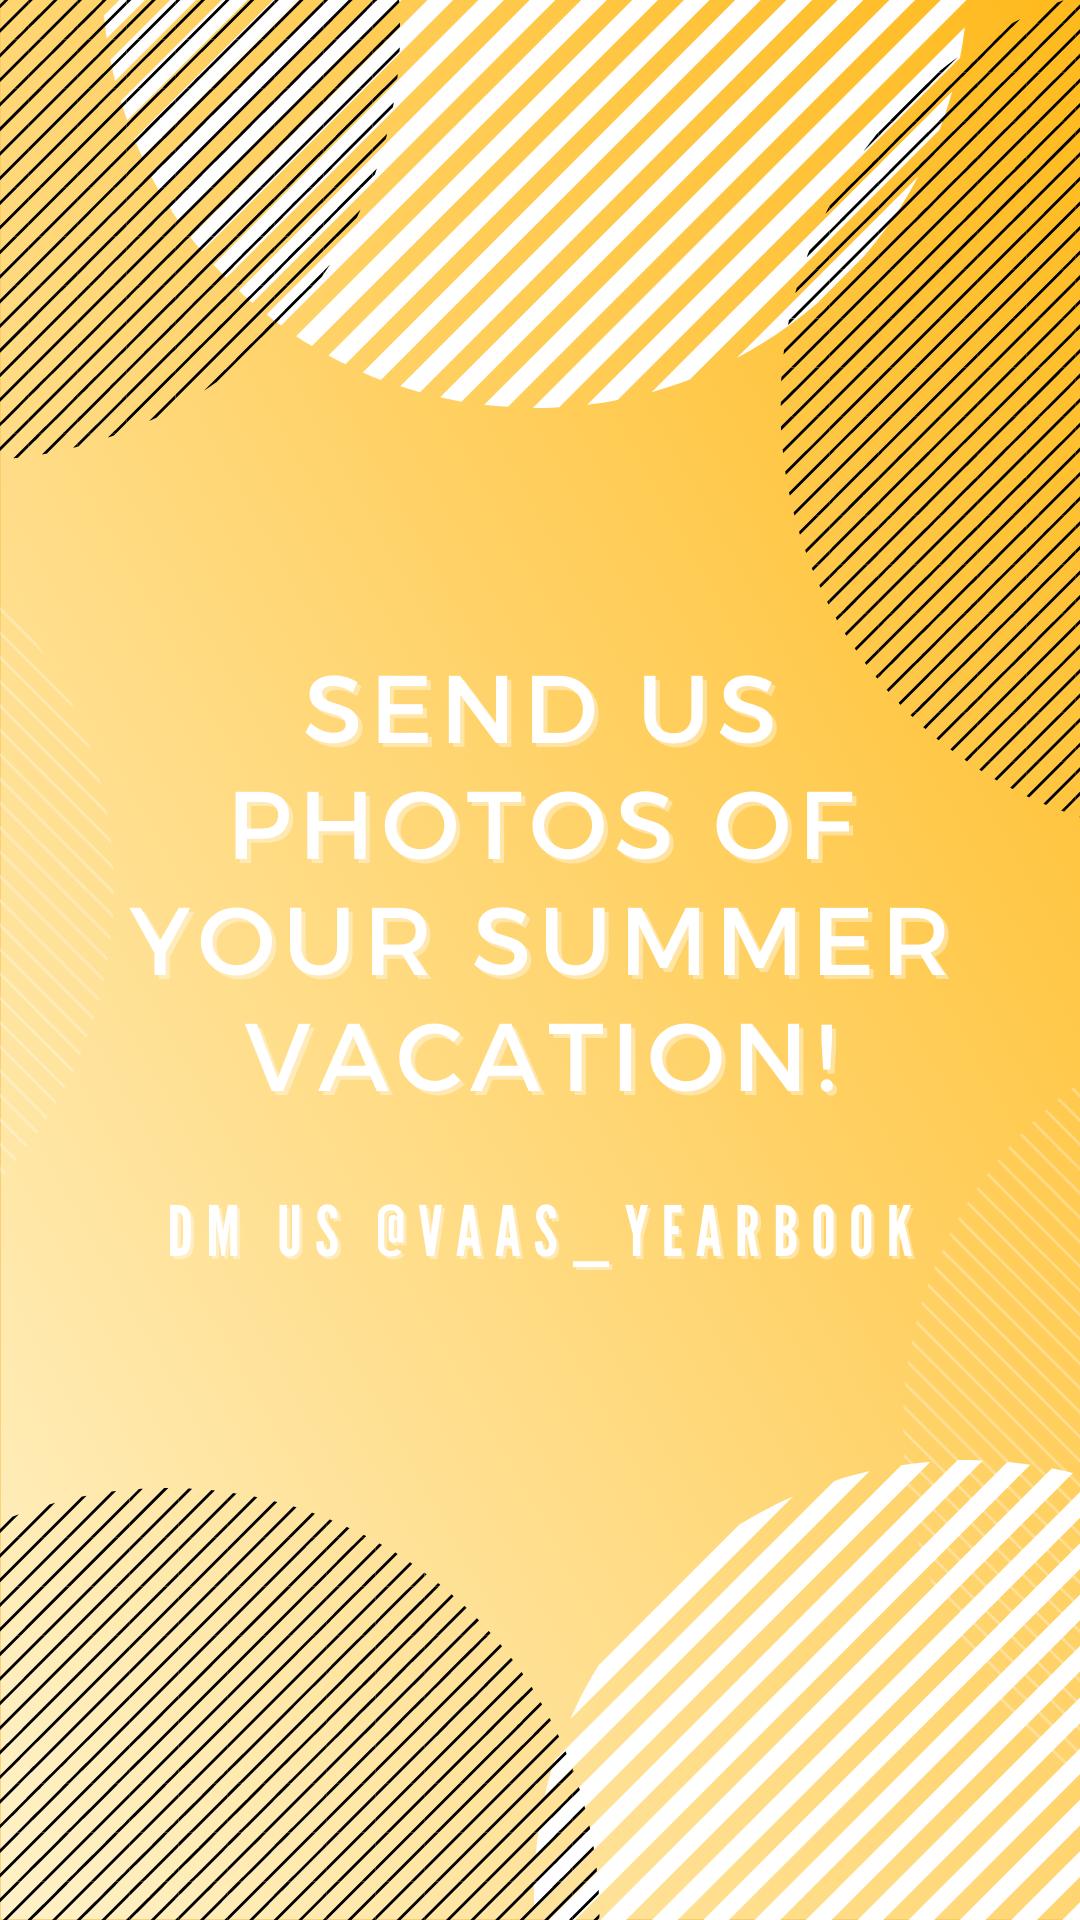 Summer Photos Request